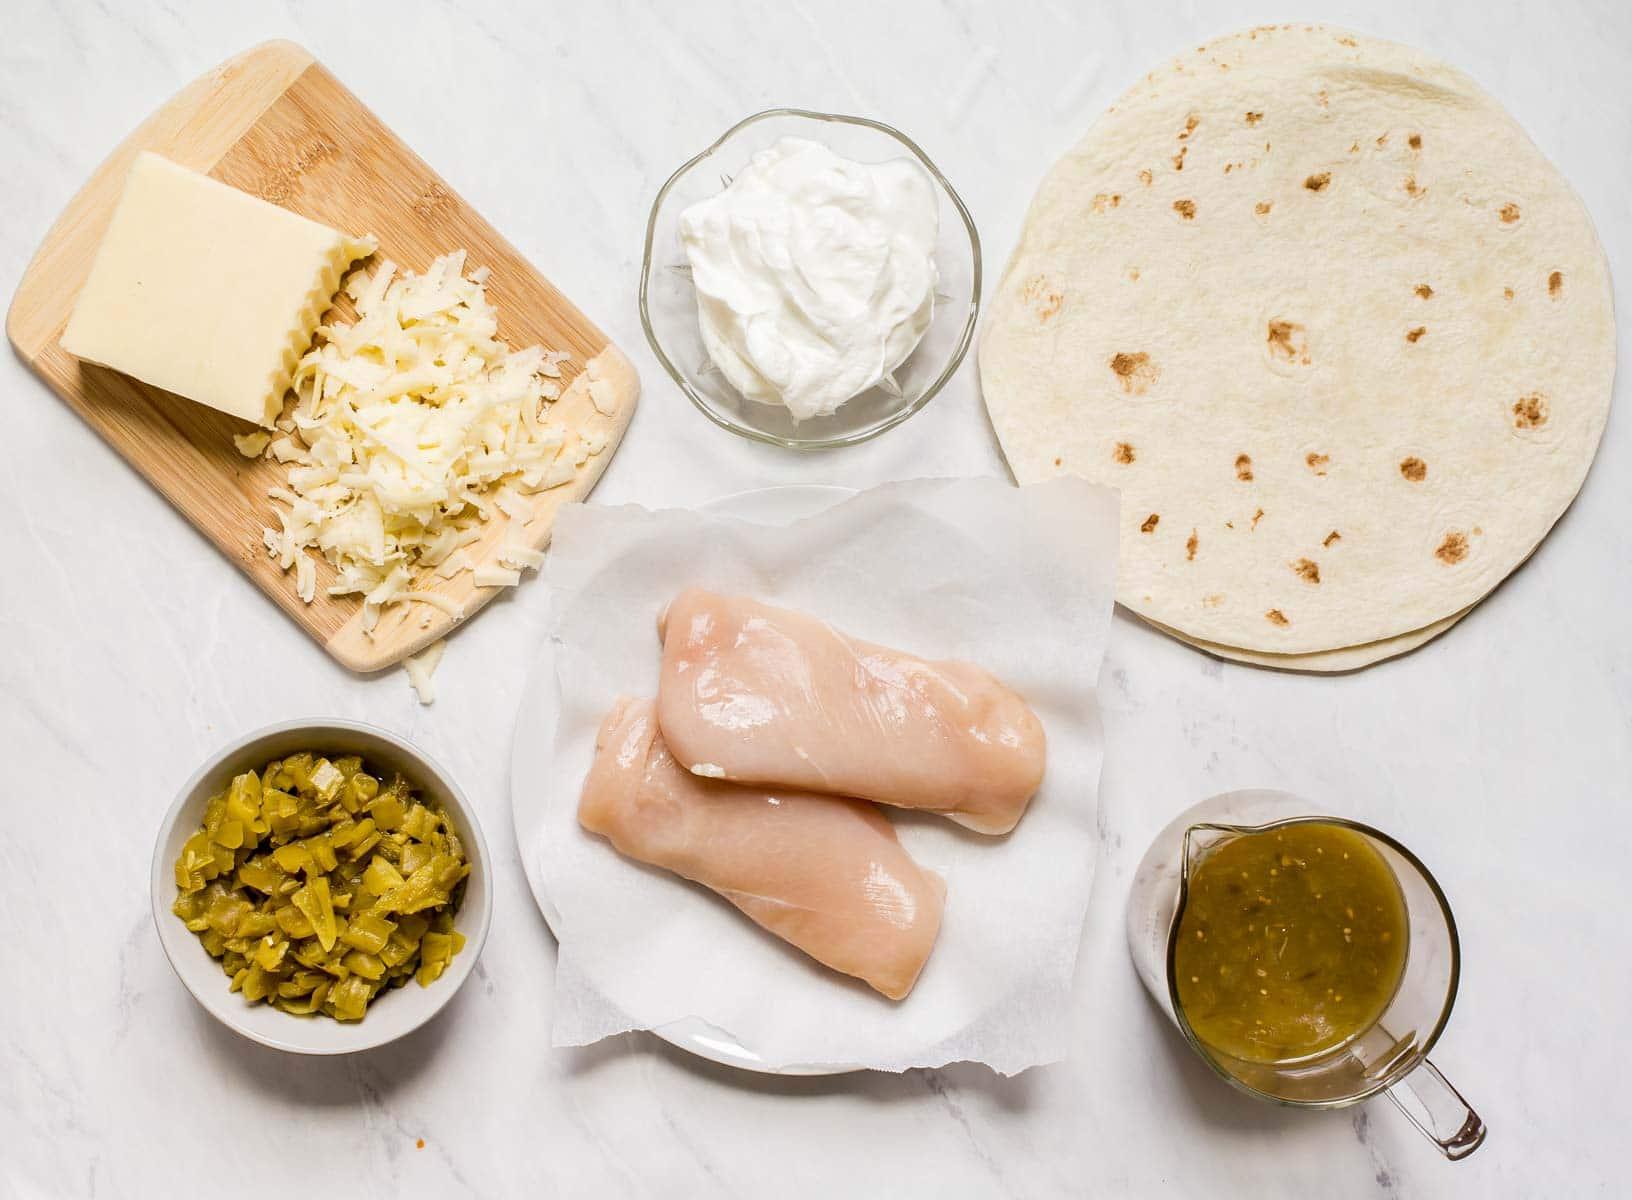 Ingredients for white chicken enchiladas on white table.